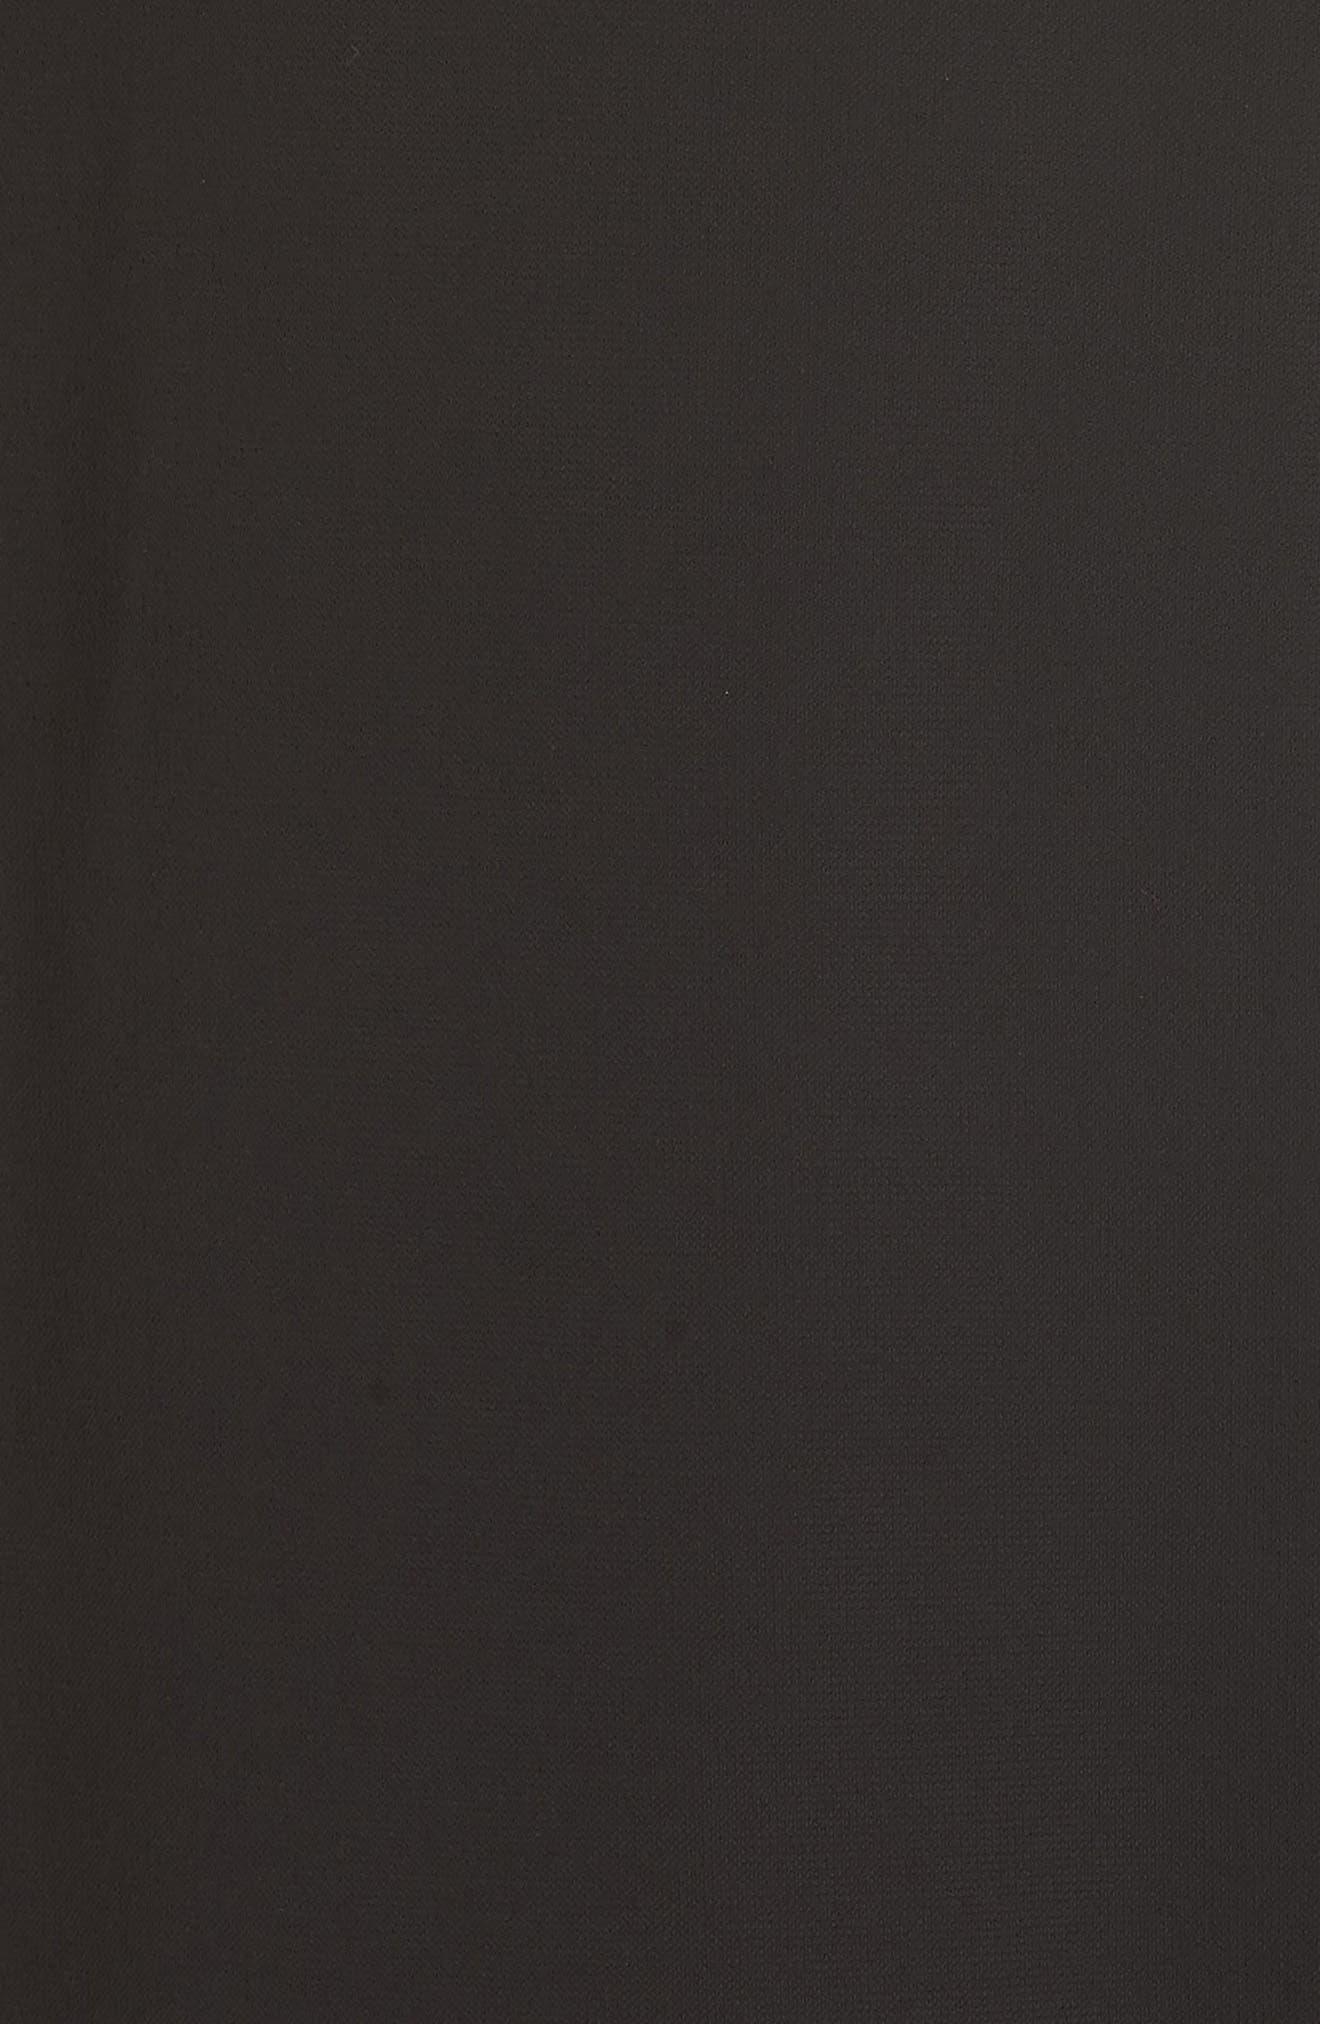 Cascade Sleeve Sheath Dress,                             Alternate thumbnail 5, color,                             001